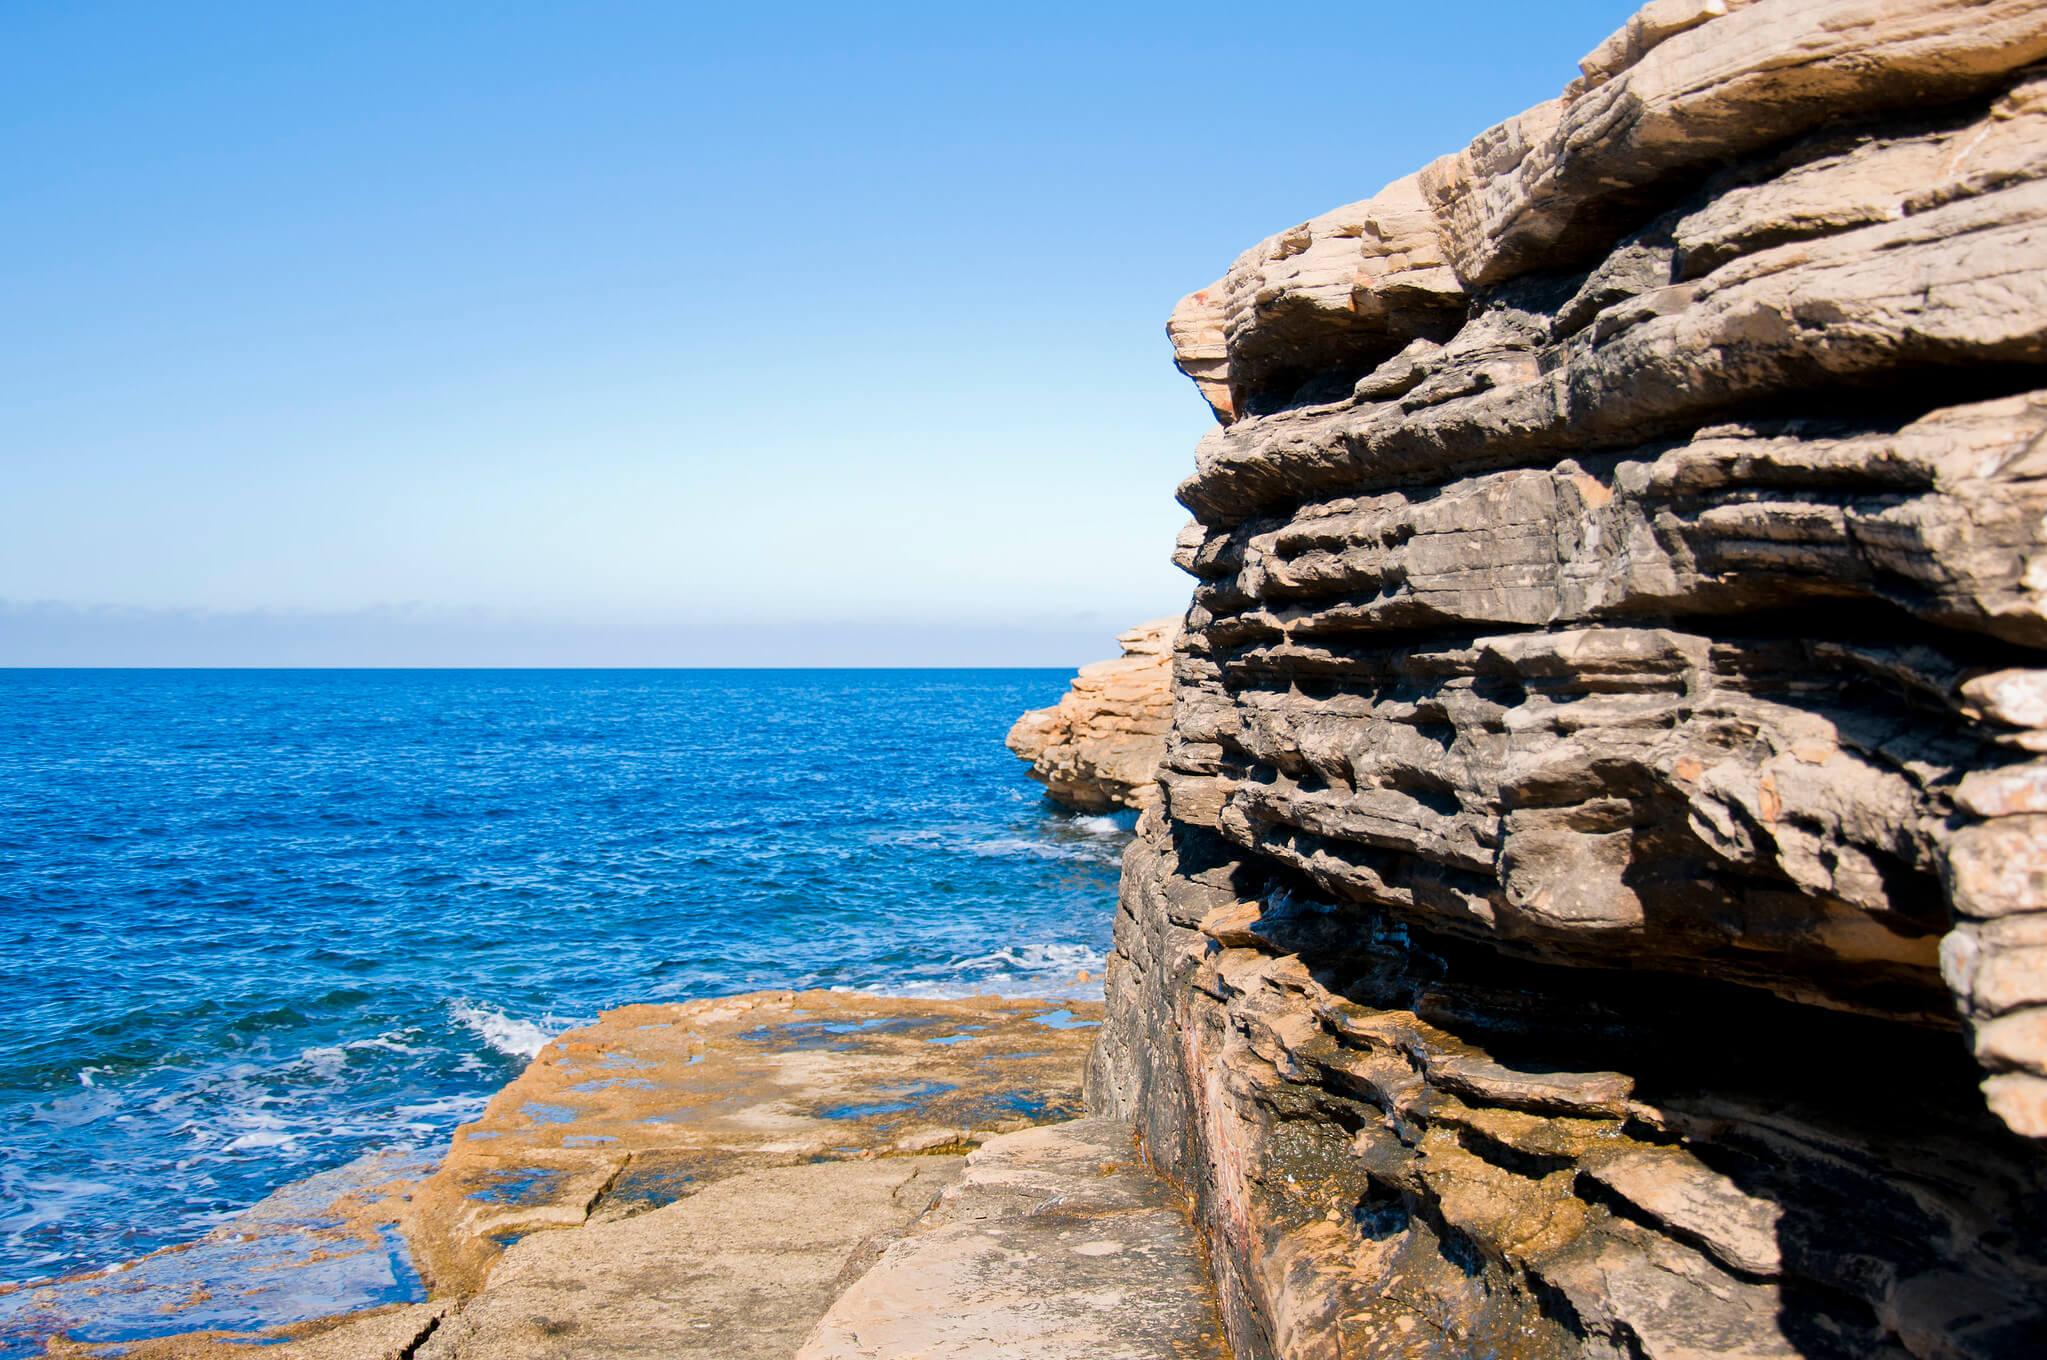 https://www.white-ibiza.com/wp-content/uploads/2020/03/ibiza-beaches-punta-galera-03.jpg